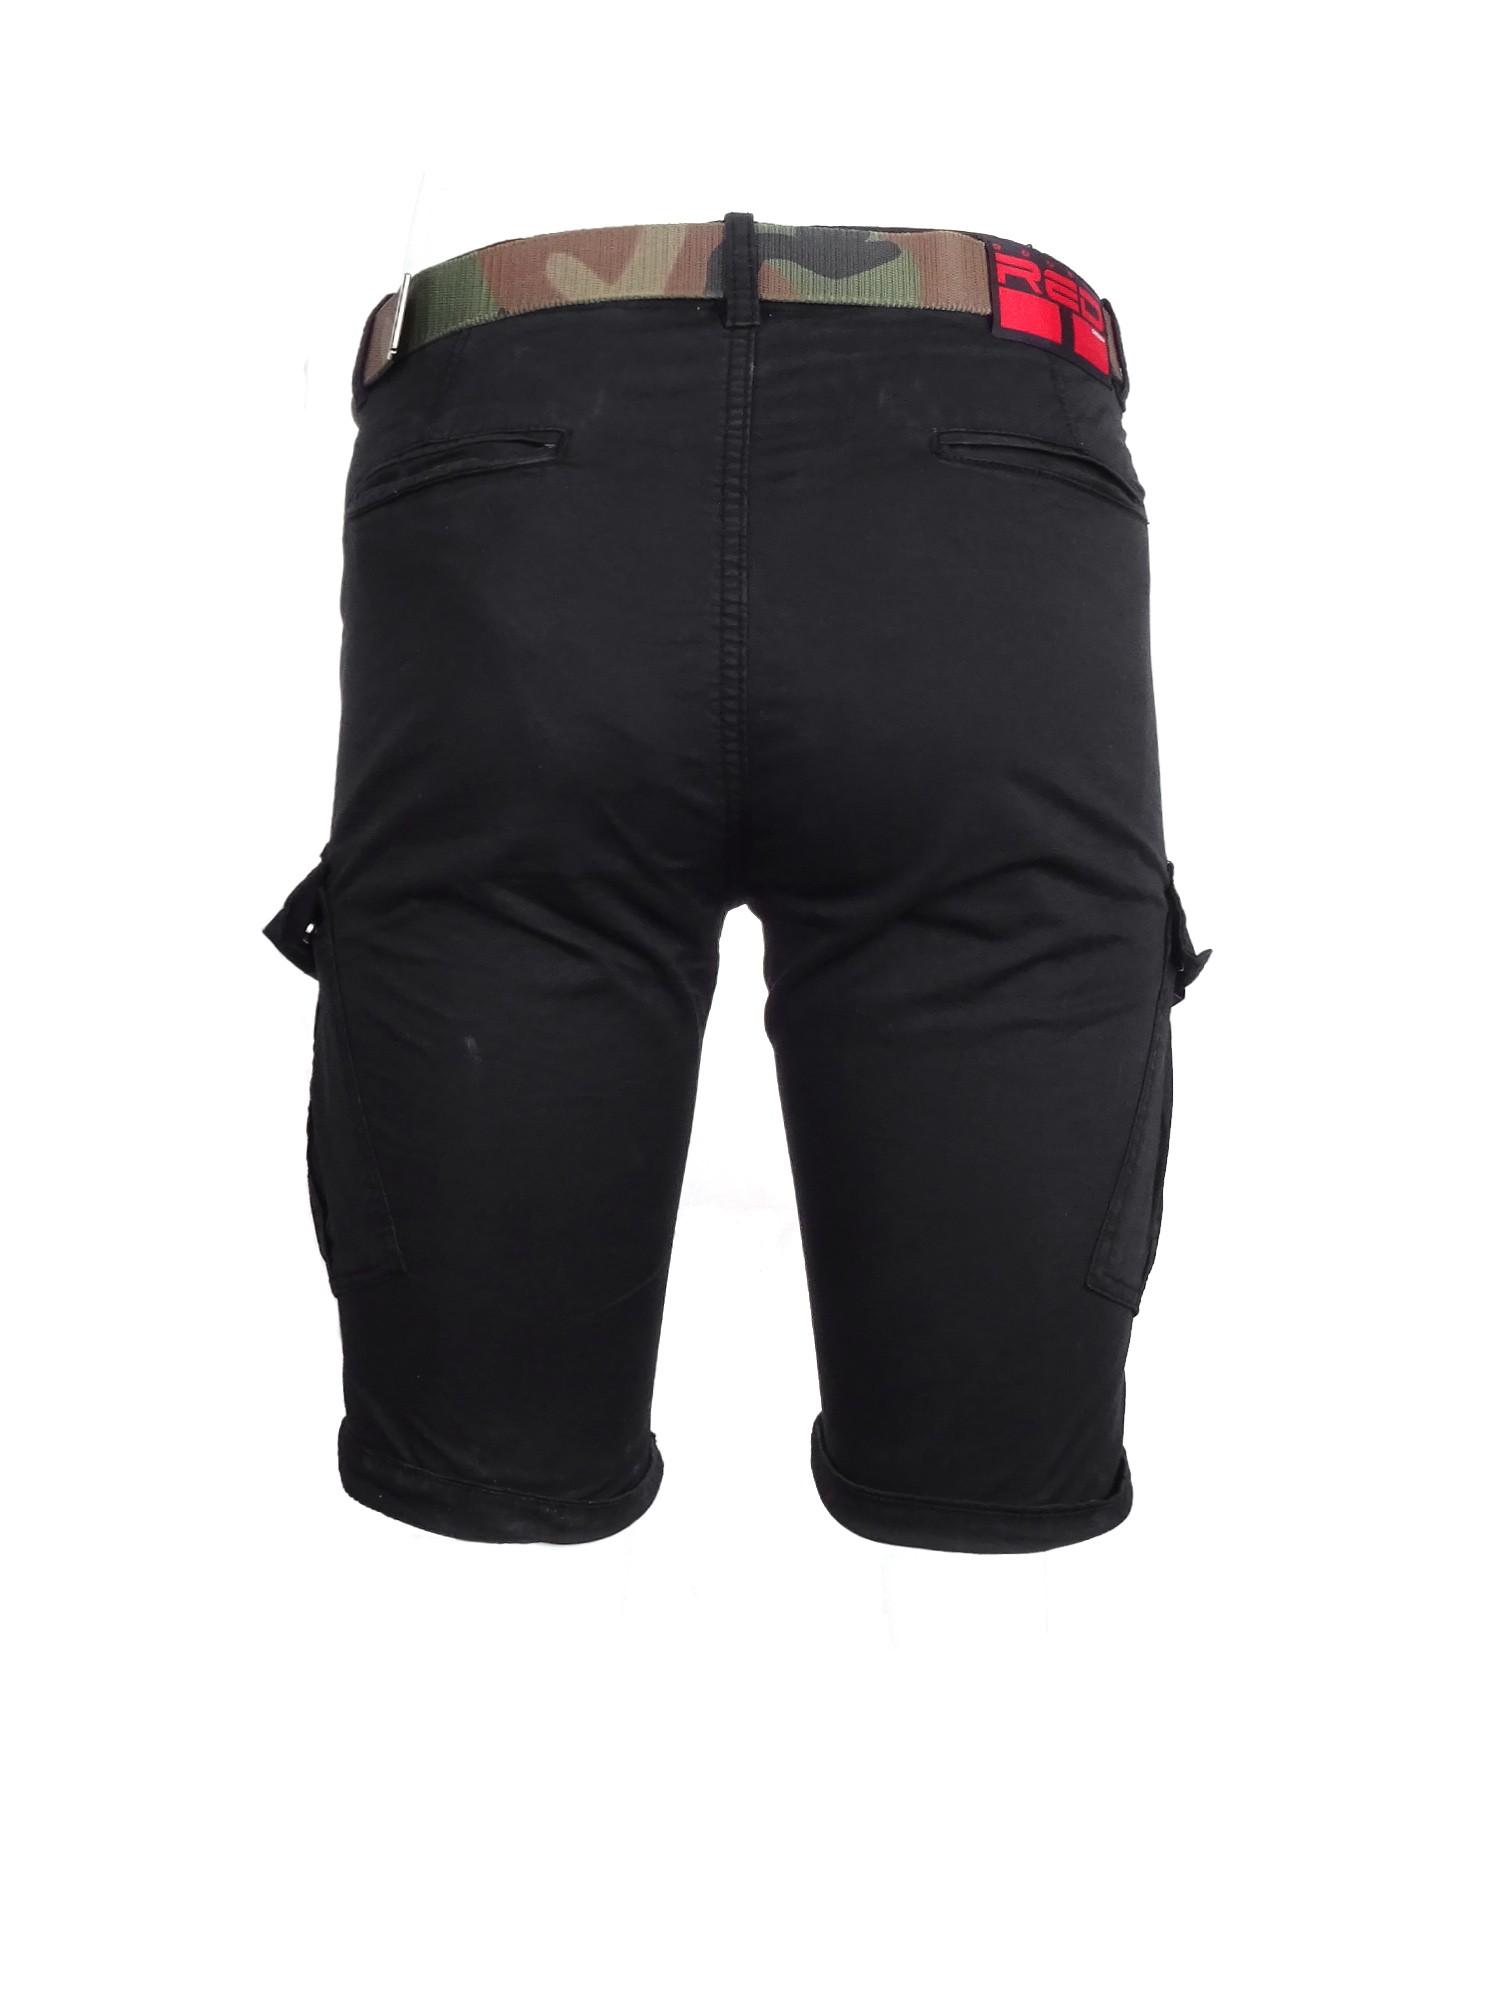 DR M Cargo Shorts Black